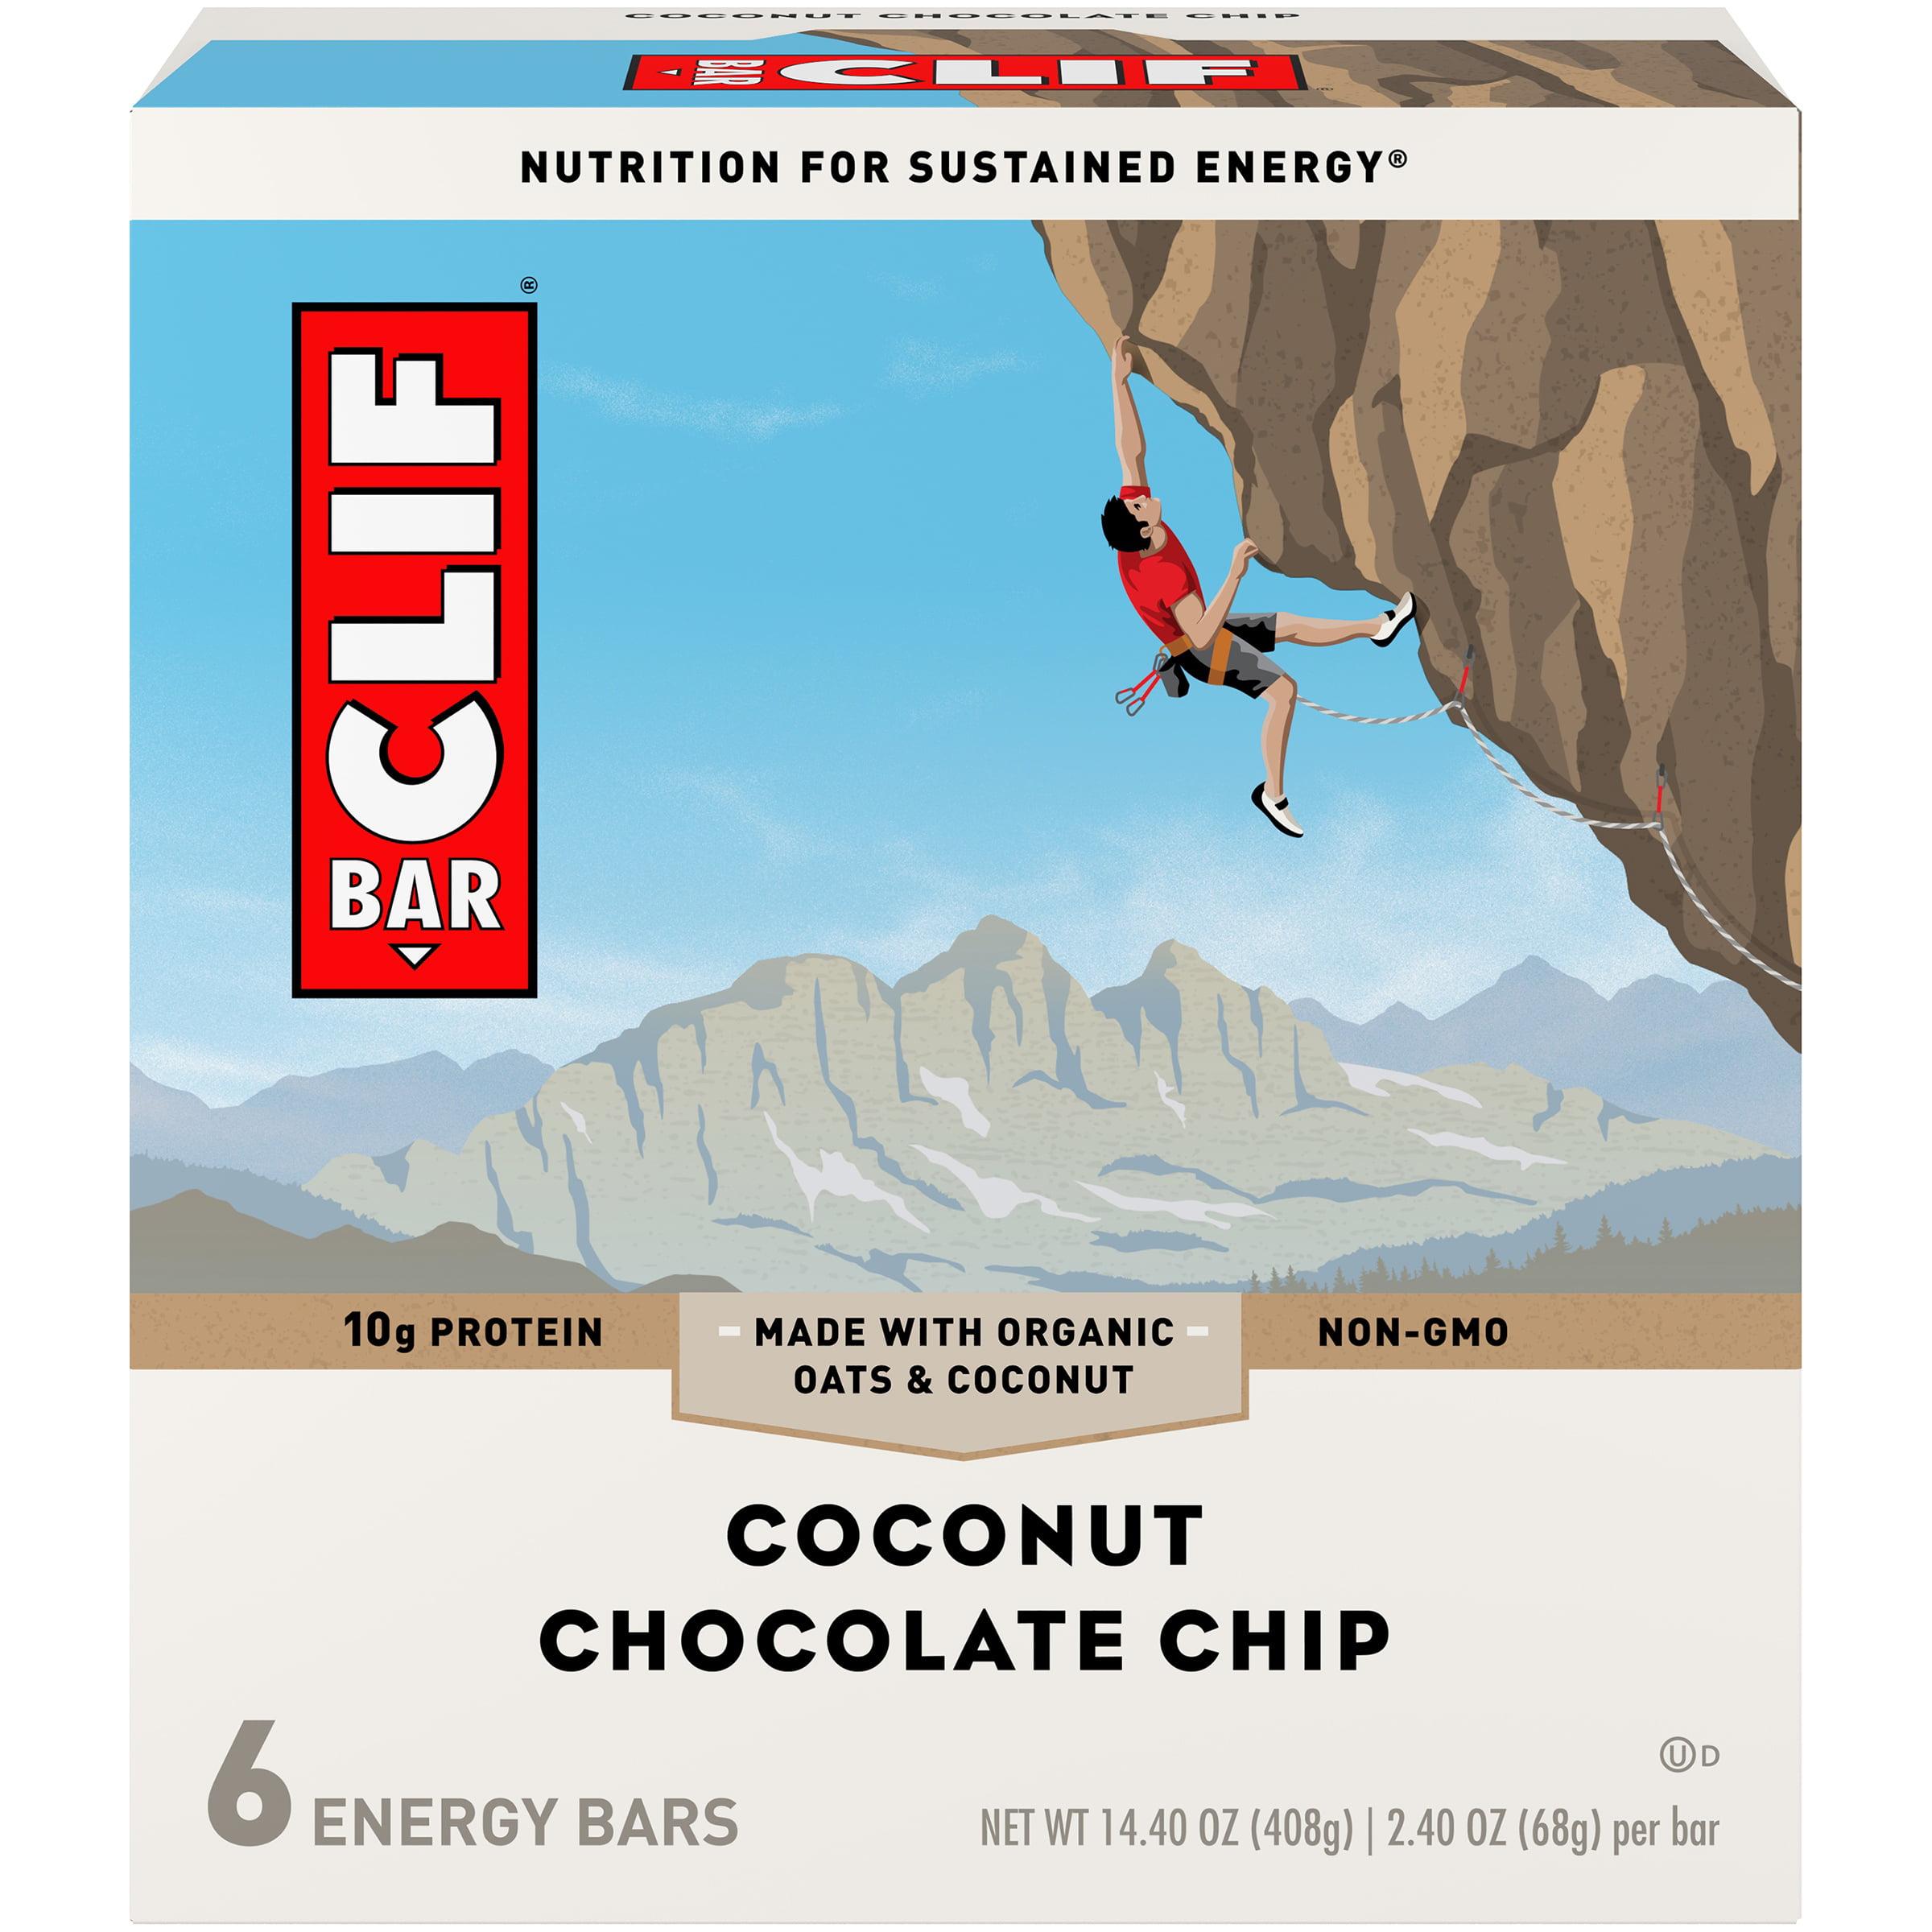 Clif Bar' Coconut Chocolate Chip Energy Bars 6 2 4 oz Bars